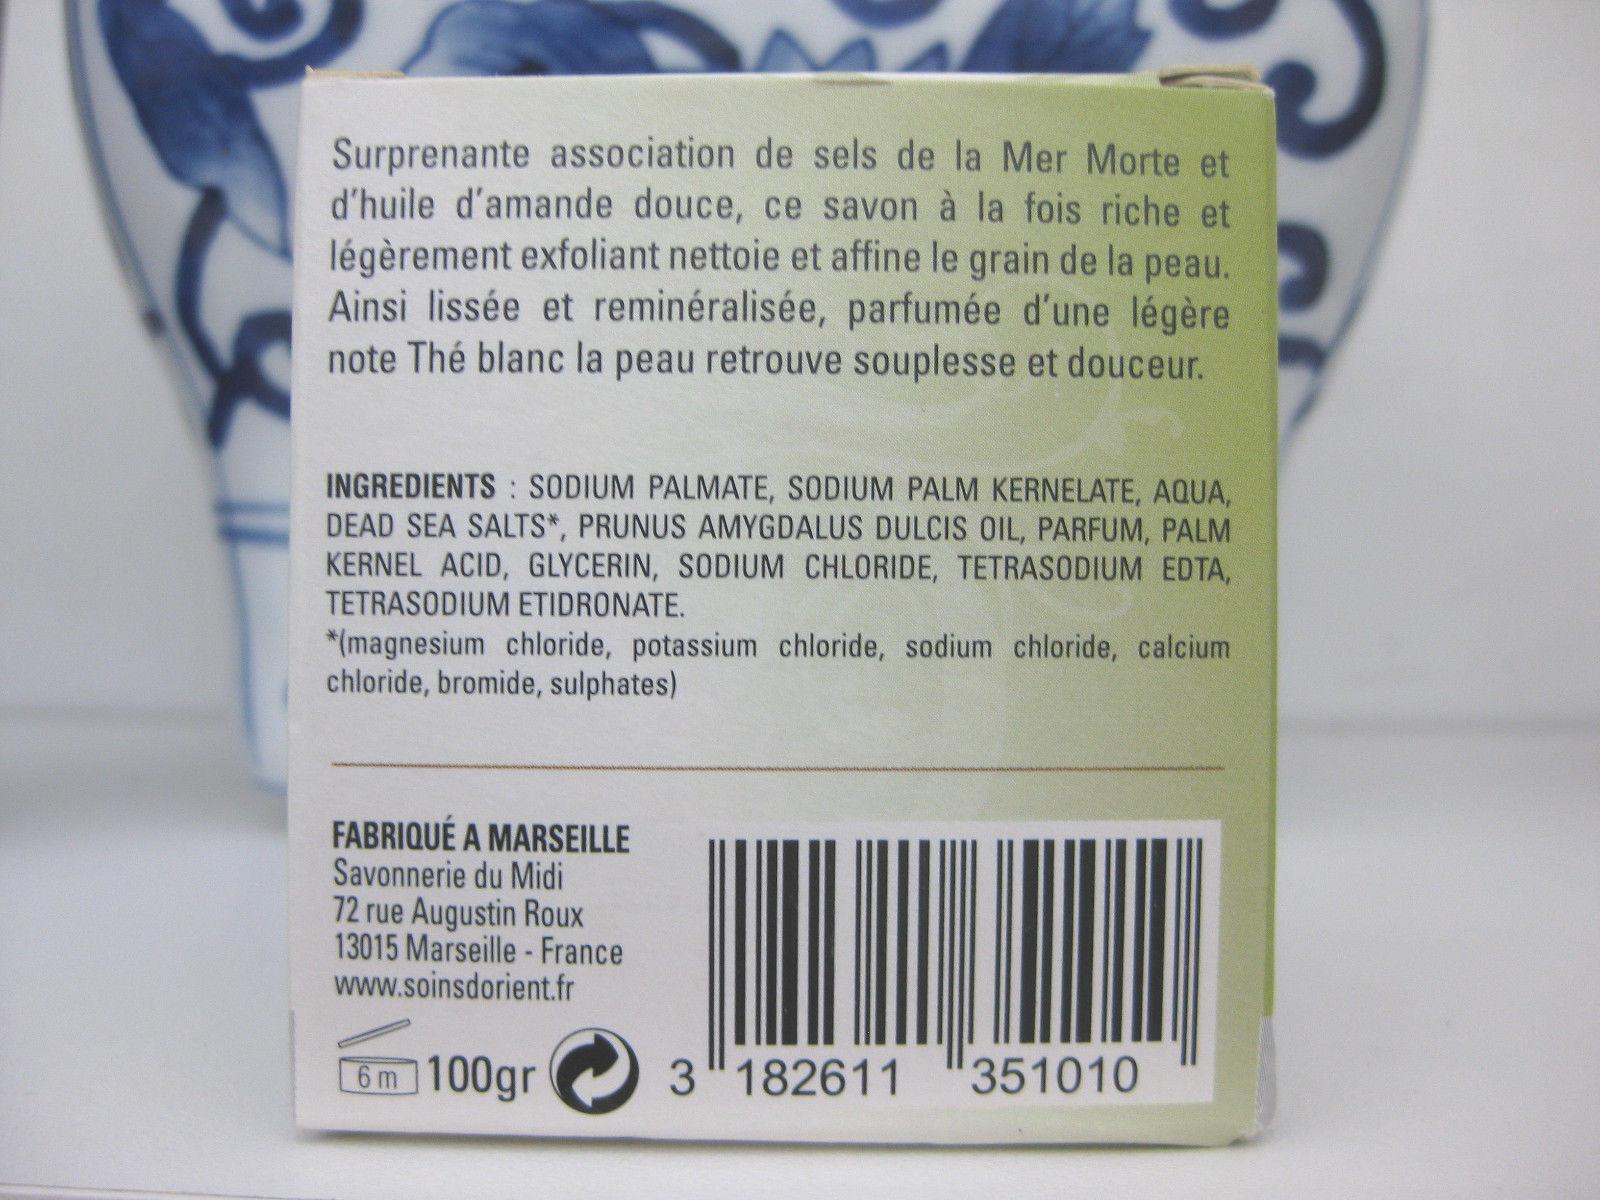 Soins d'Orient Organic Soap Savon Au Rhassoul & Argan Oil from France